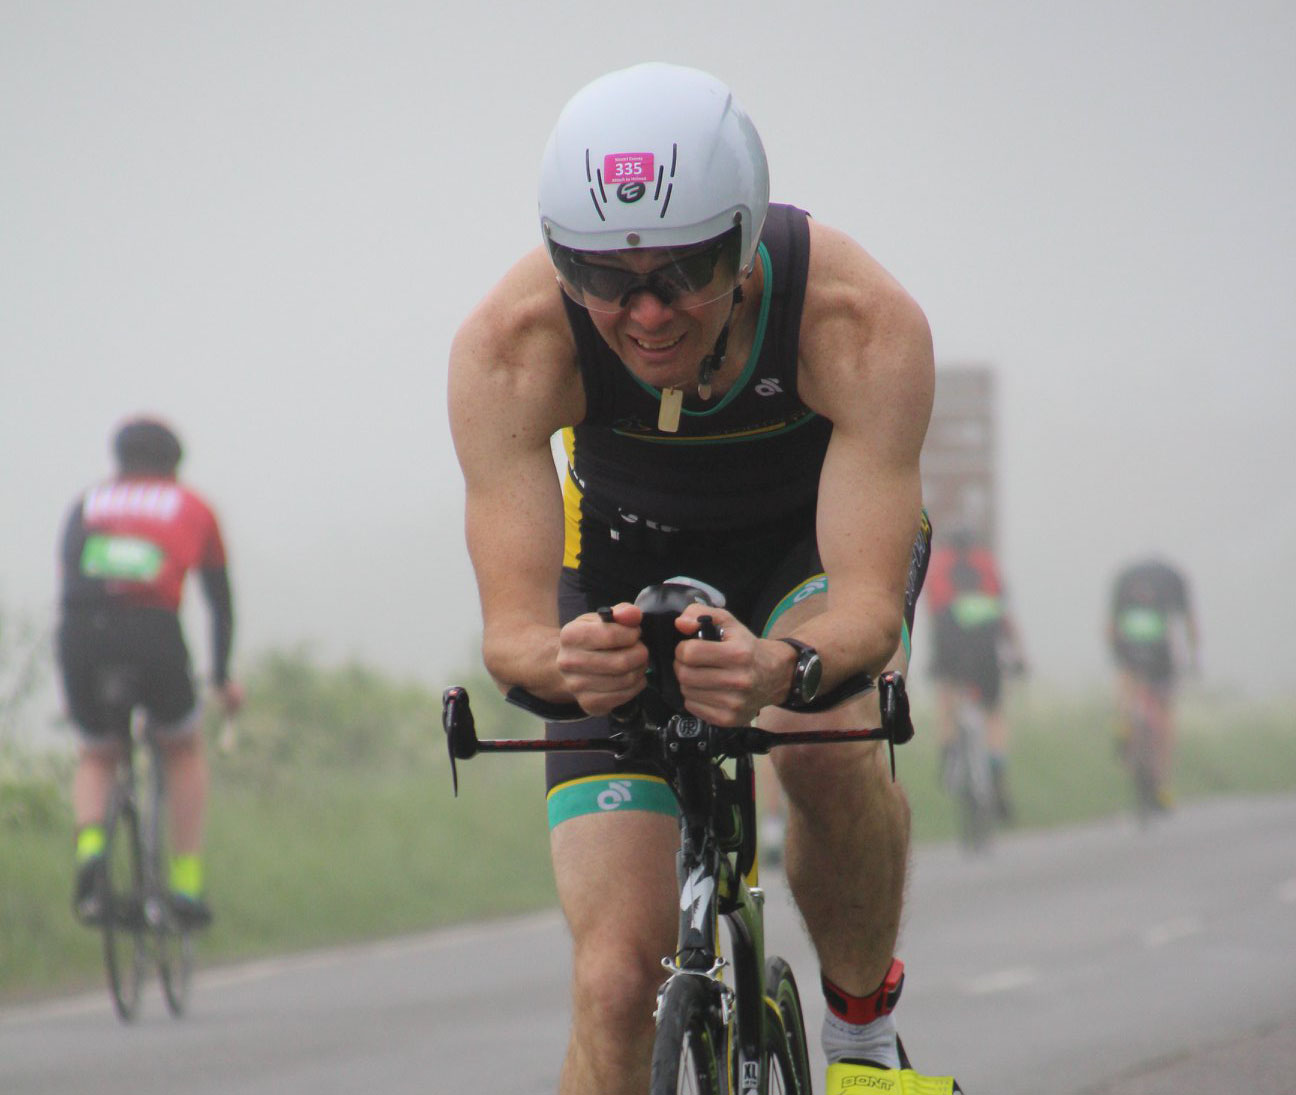 http://www.stortfordtri.org.uk/wp-content/uploads/2019/08/dave_bike.jpg